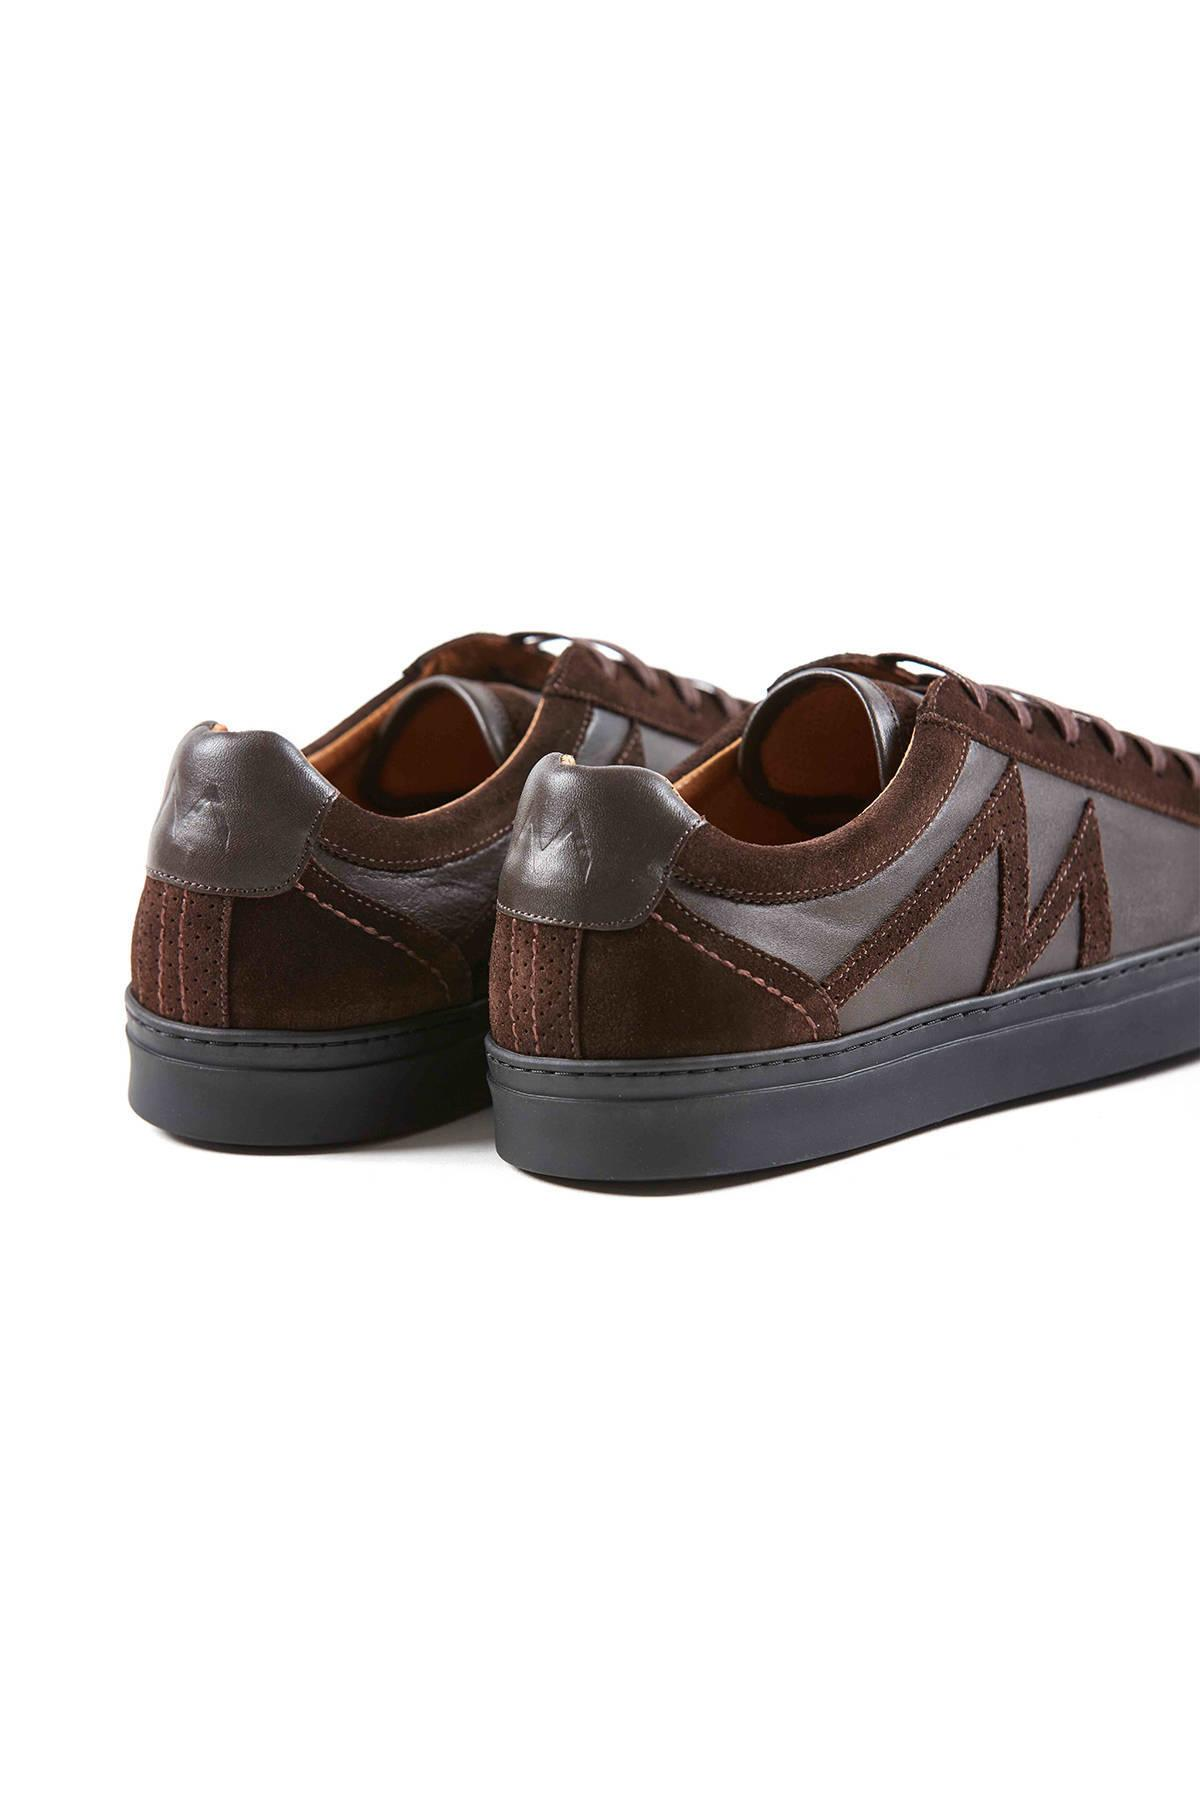 Kahverengi Deri Sneakers